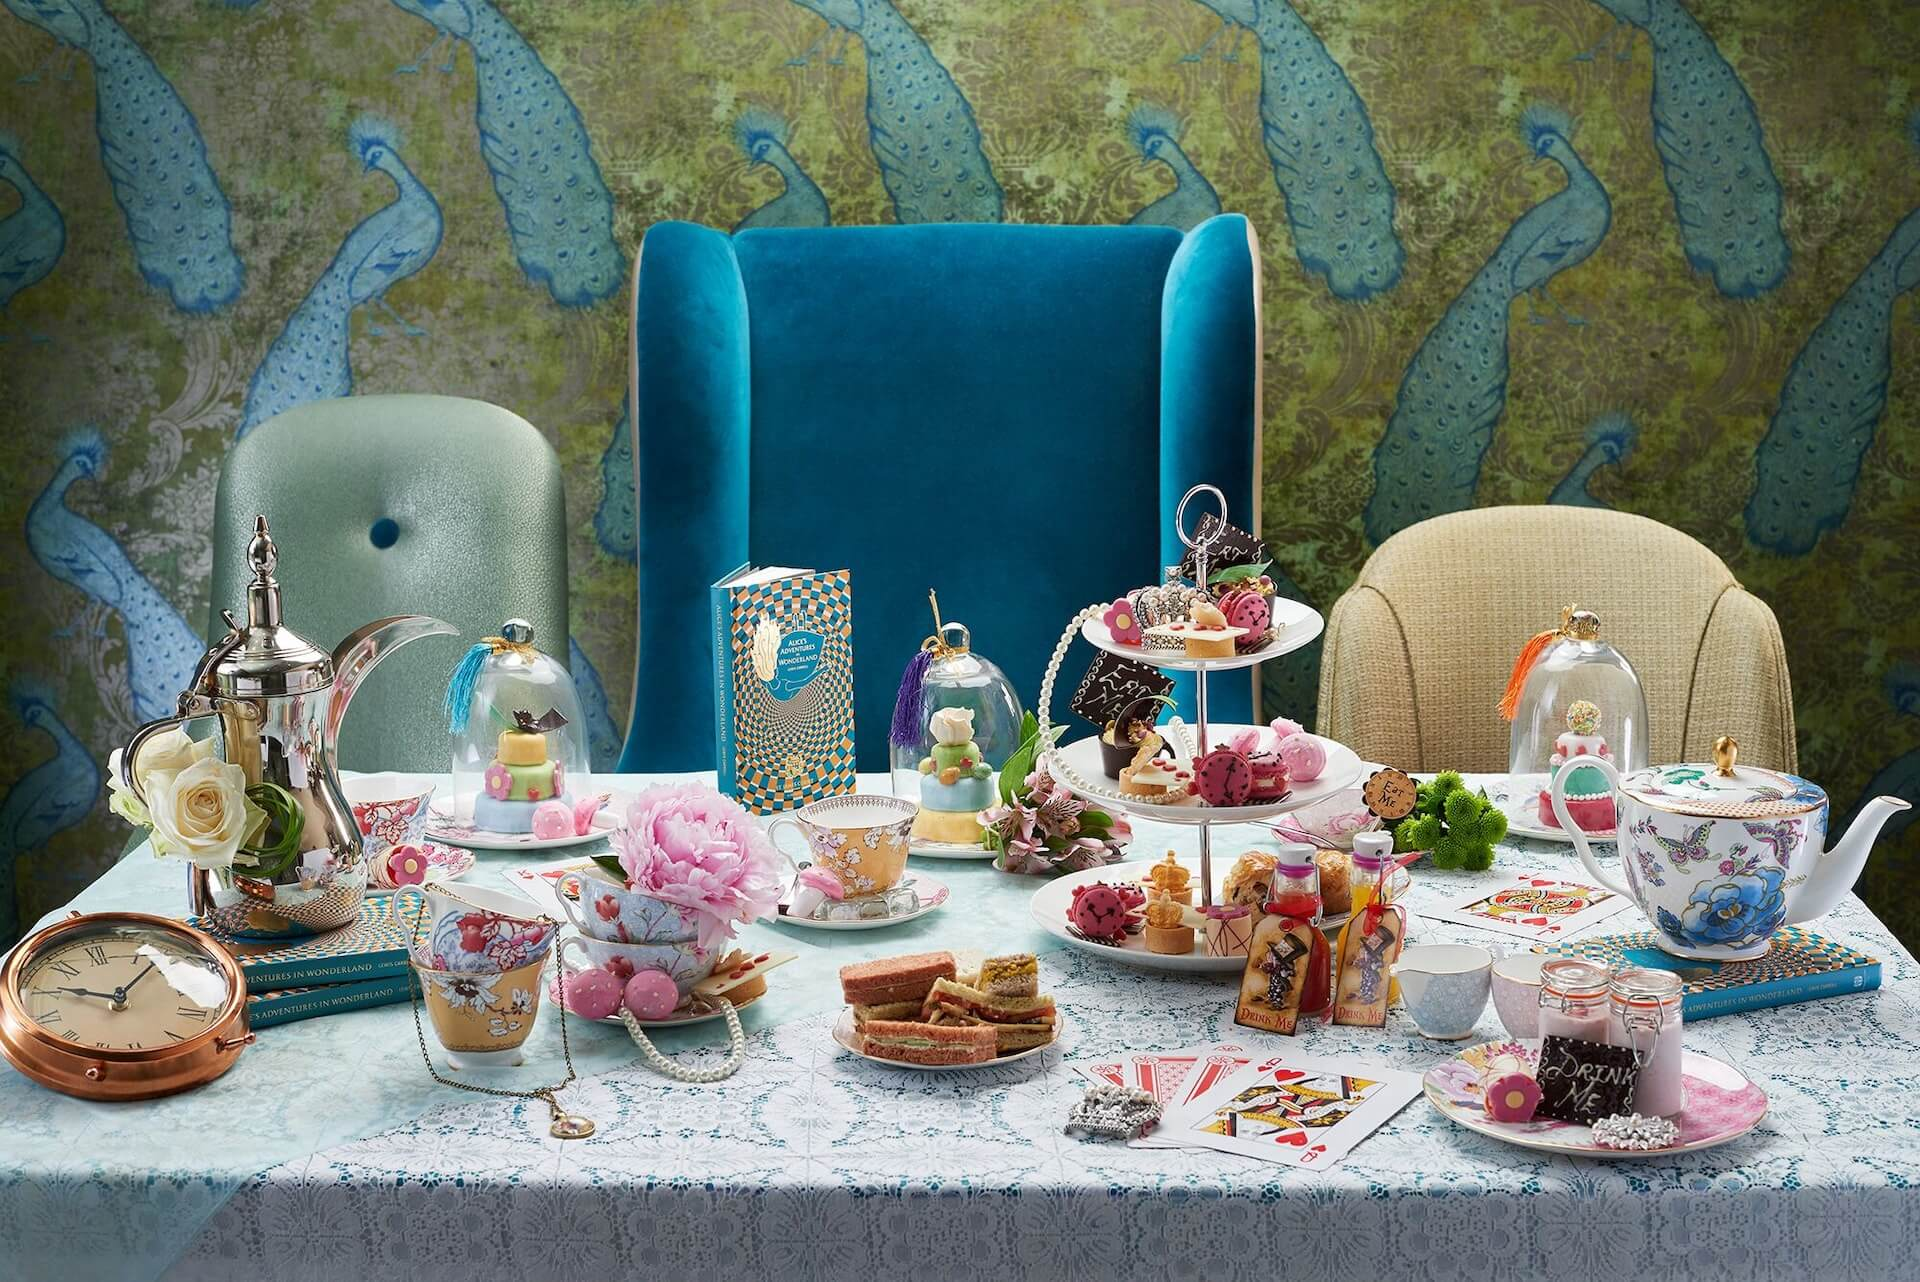 St James's Court, A Taj Hotel Serves an Alice in Wonderland themed tea